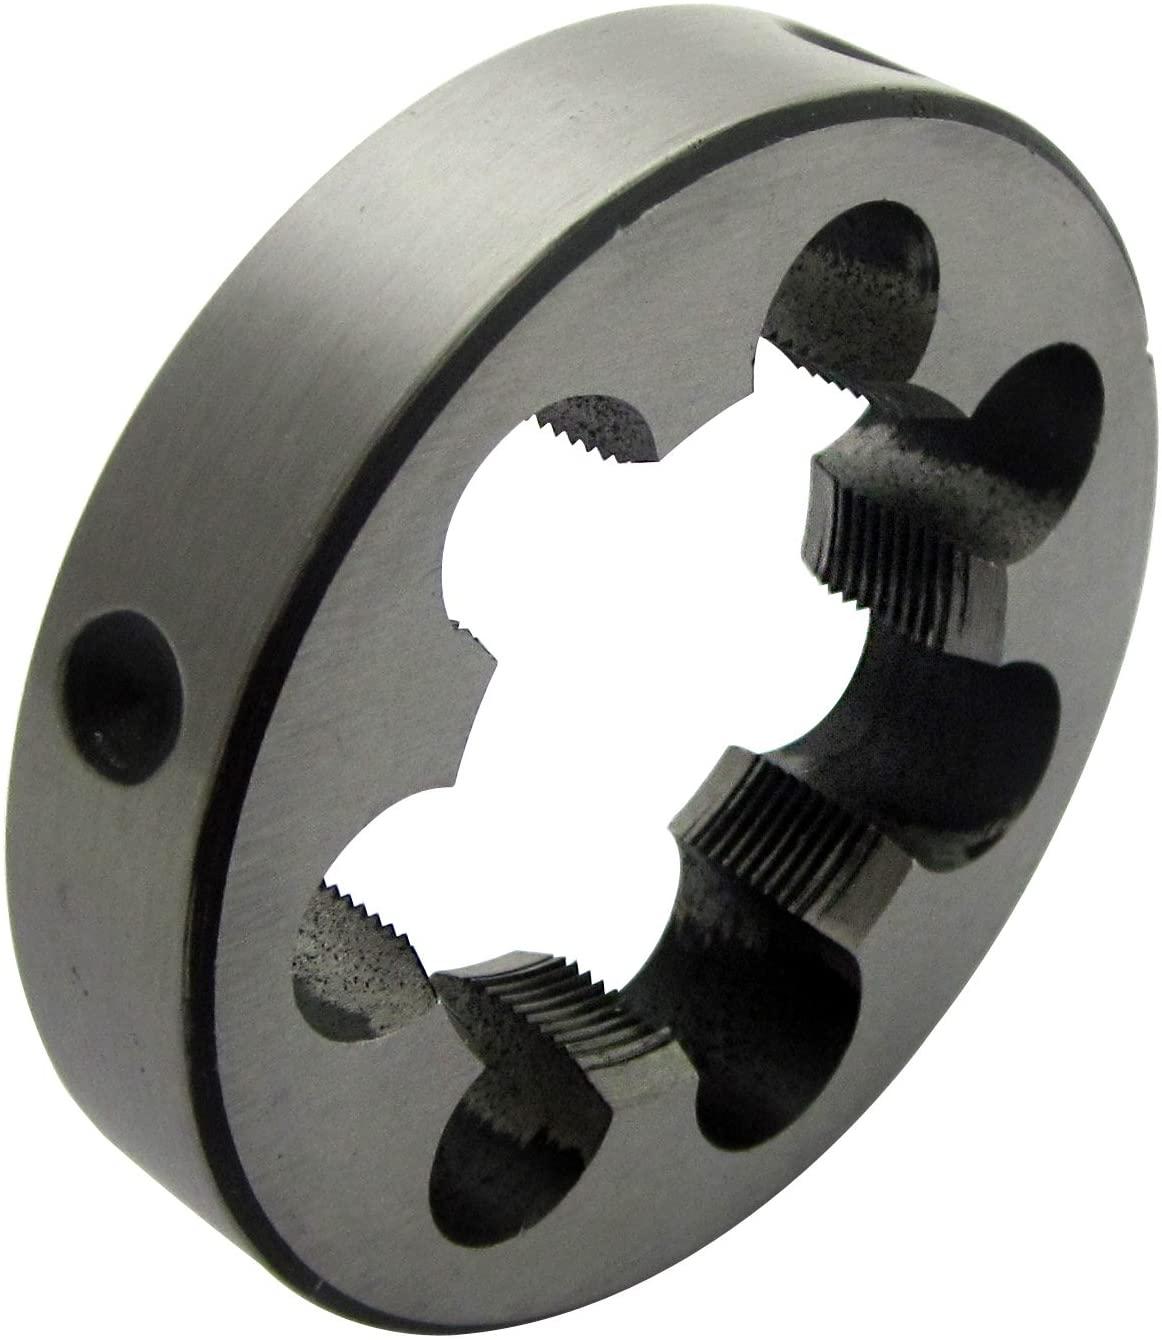 37mm X 1.5 Metric Right Hand Thread Die M37 X 1.5mm Pitch